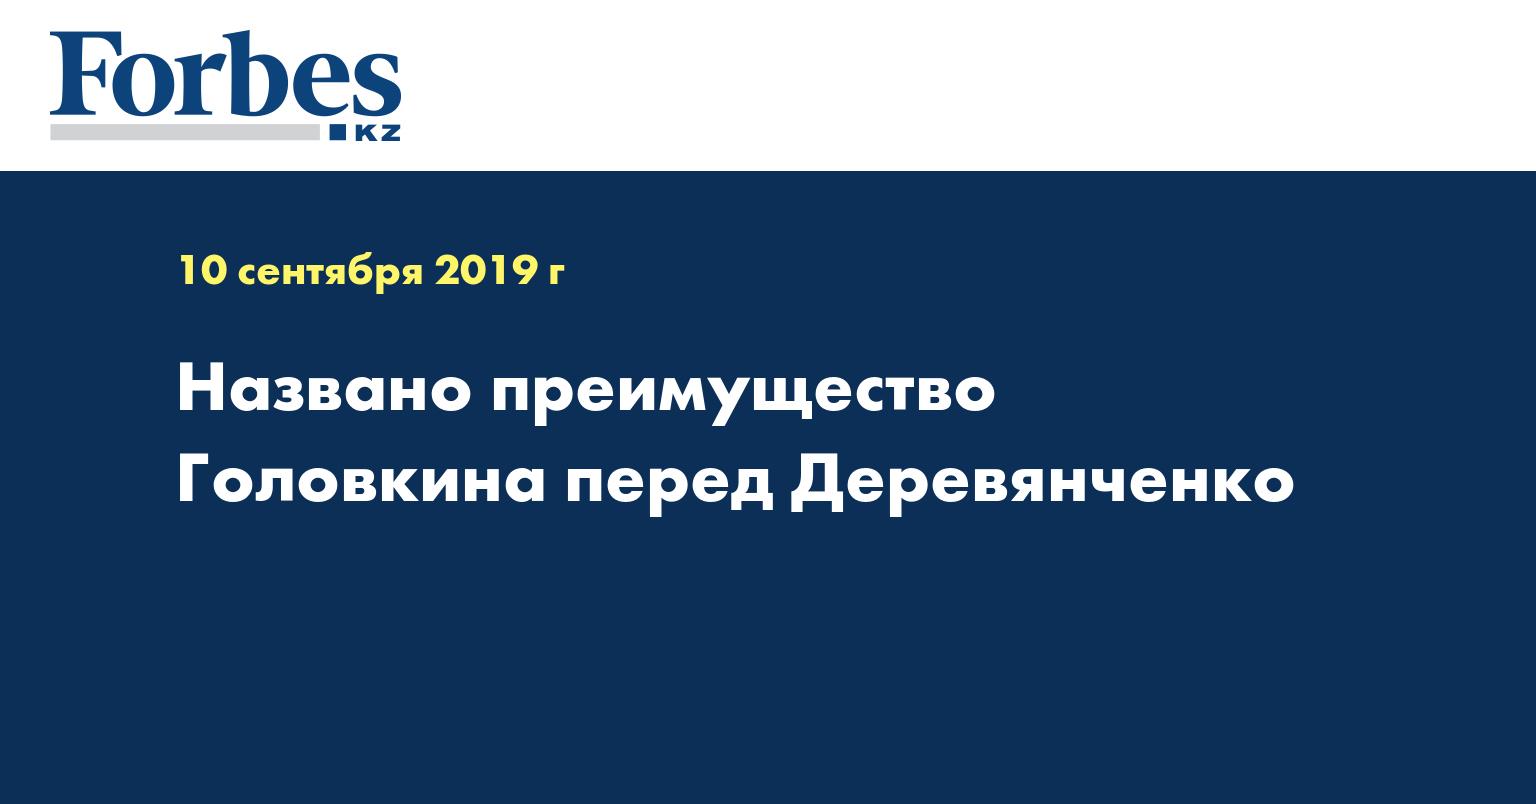 Названо преимущество Головкина перед Деревянченко